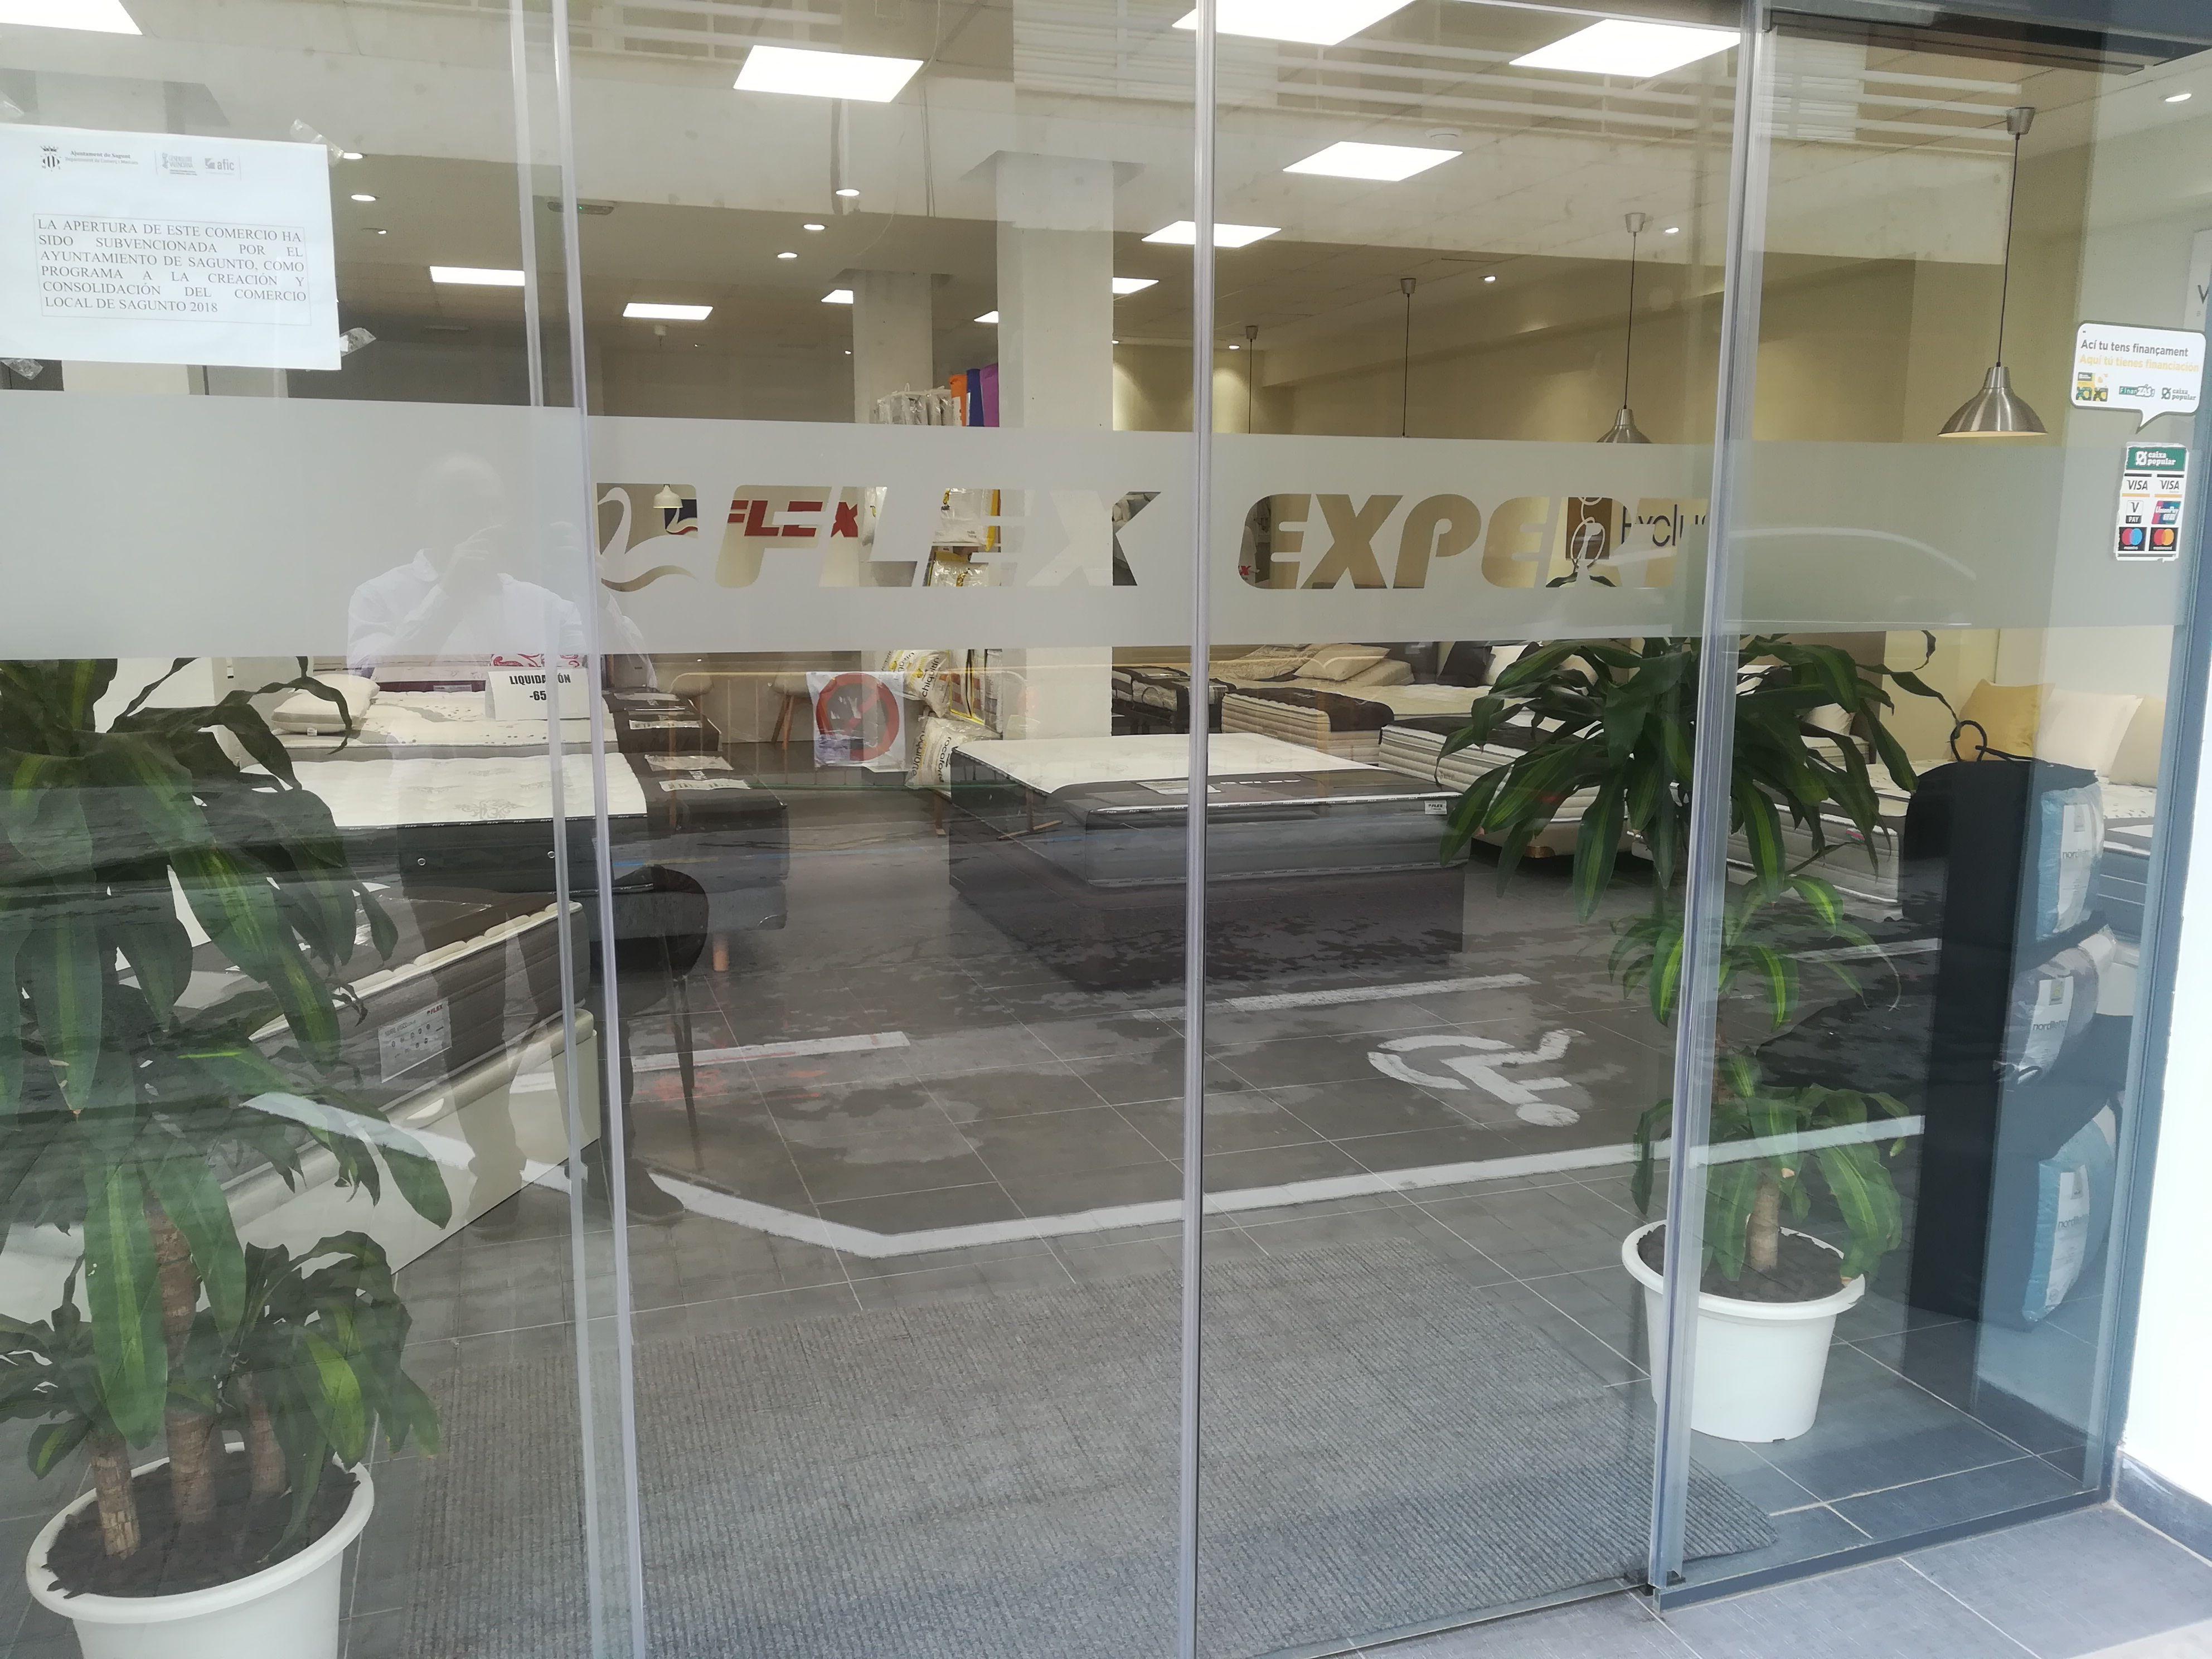 Tienda Flex en Sagunto